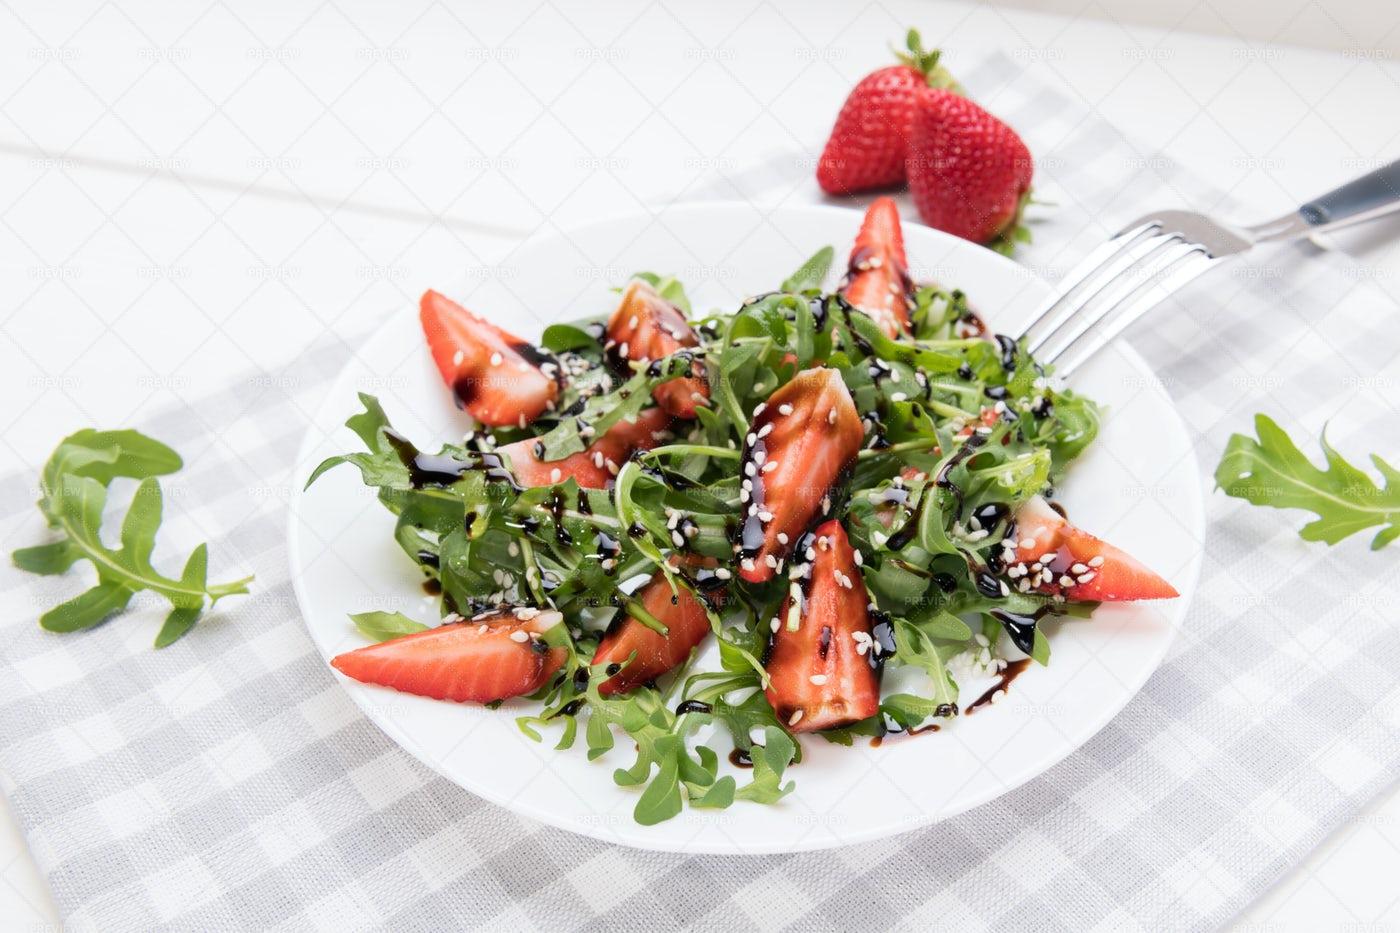 Balsamic, Strawberry And Arugula Salad: Stock Photos